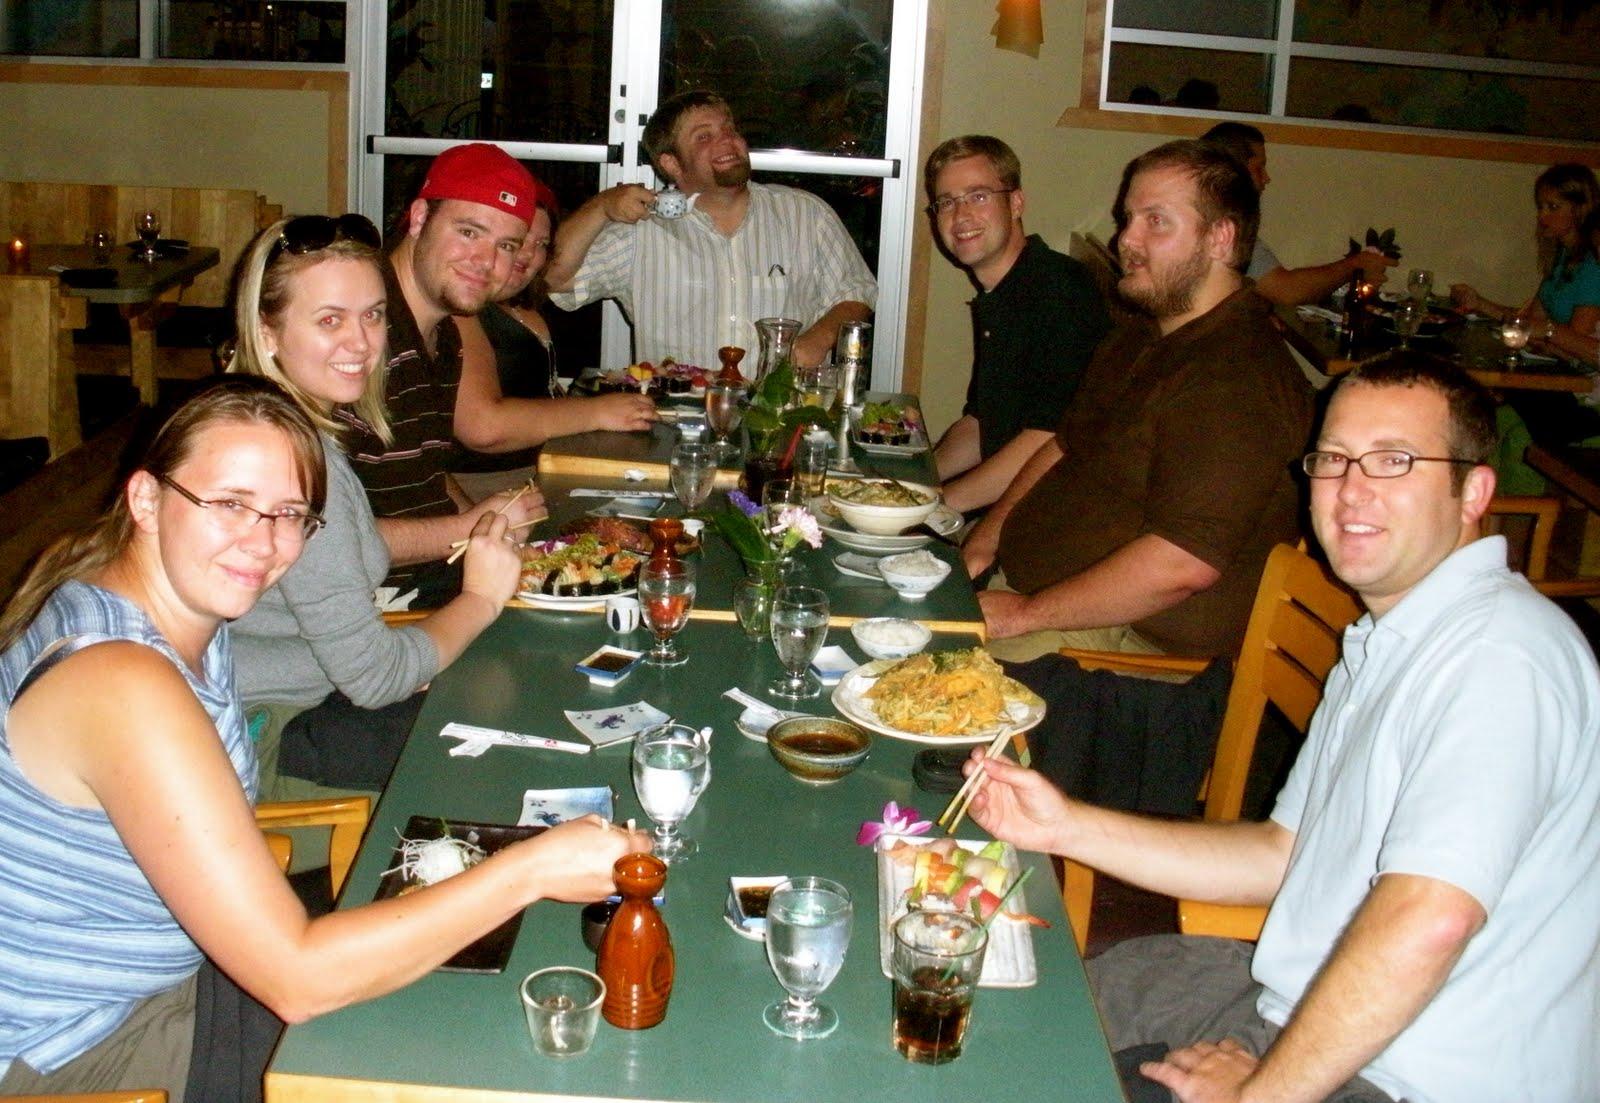 2009 - 27th birthday - Lauren planned a surprise dinner at Fuji-Ya Japanese restaurant in Uptown.  Photo credit: Liz Burke.